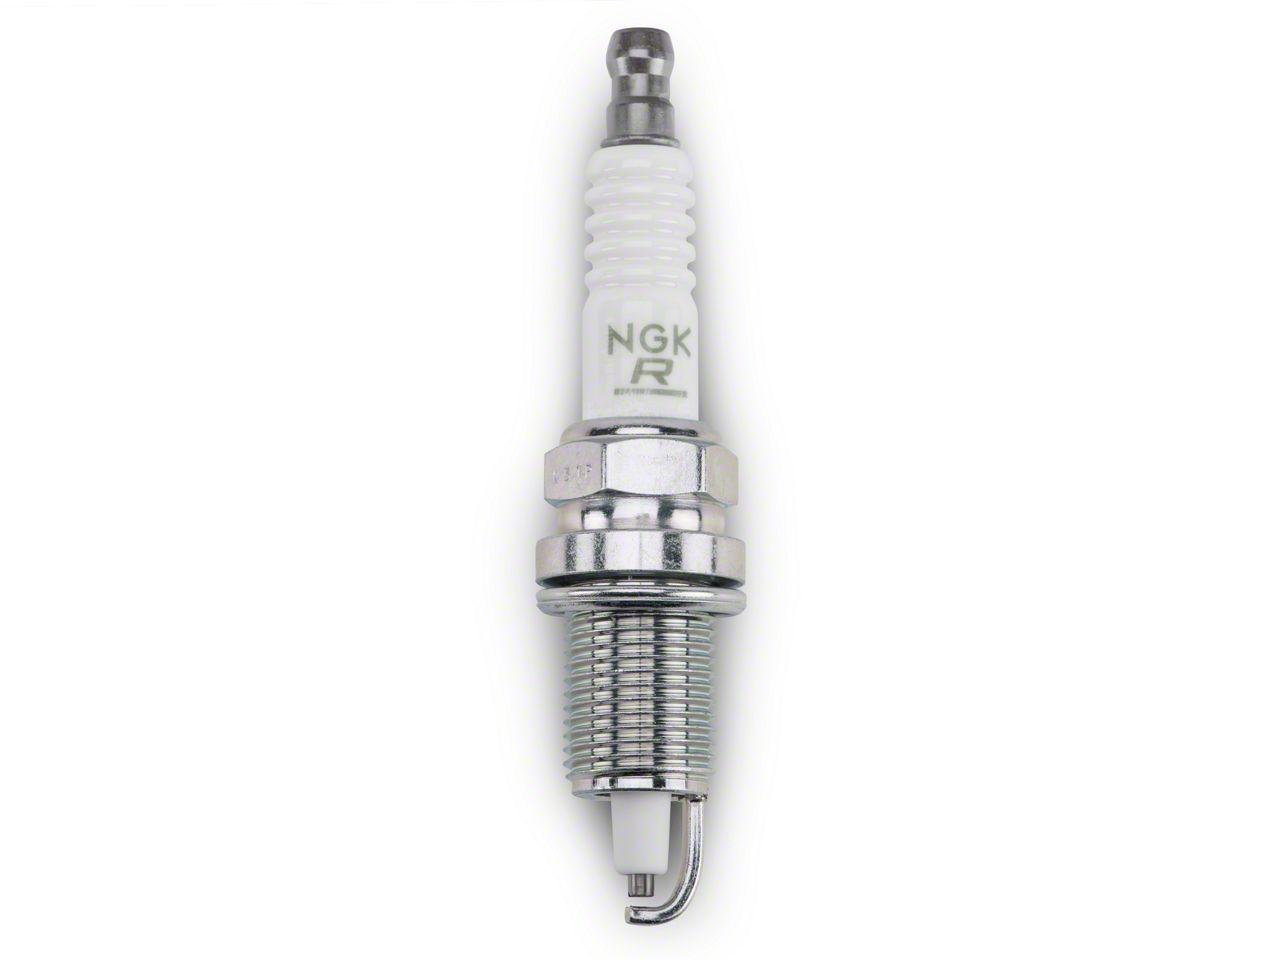 NGK V-Power Spark Plug - 4.0L (99-06 Jeep Wrangler TJ)